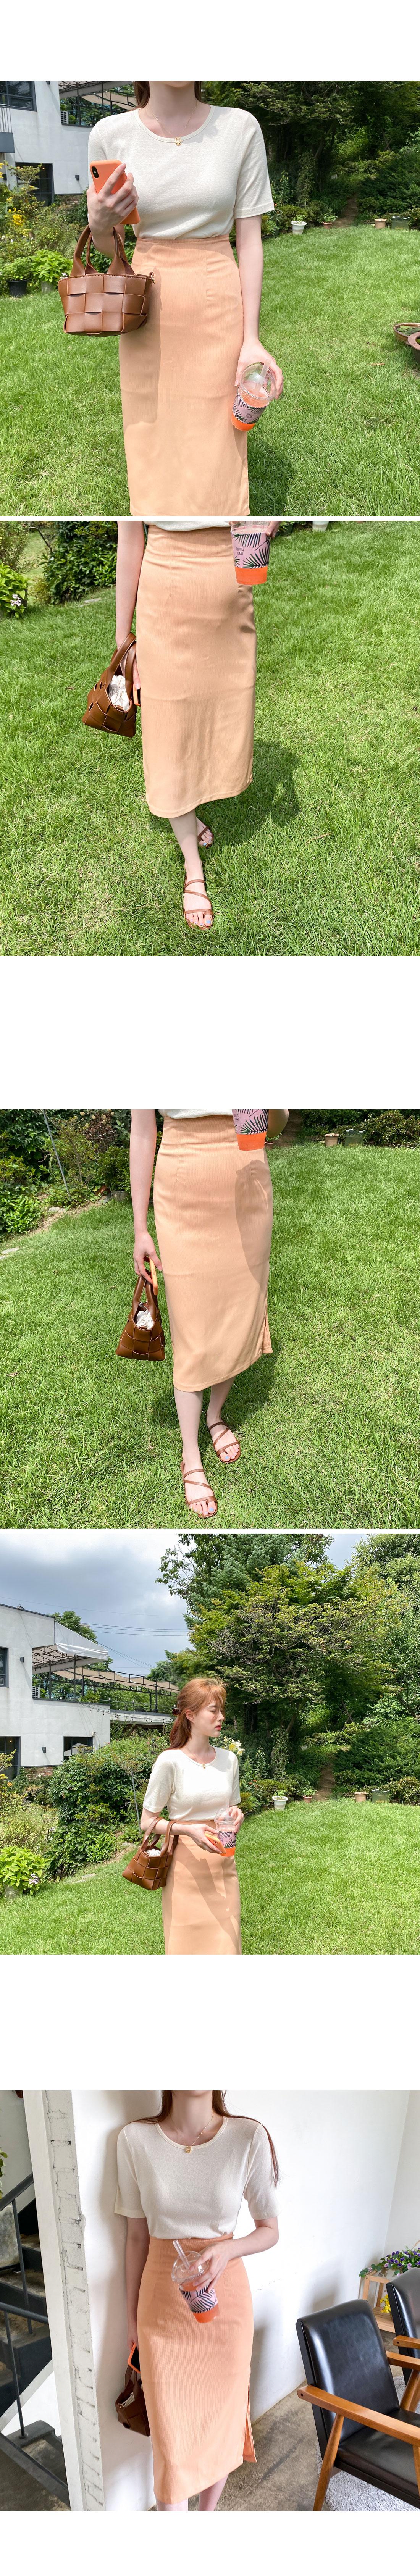 Grapefruit Split Long Skirt - Coral Orange S Same Day Shipping